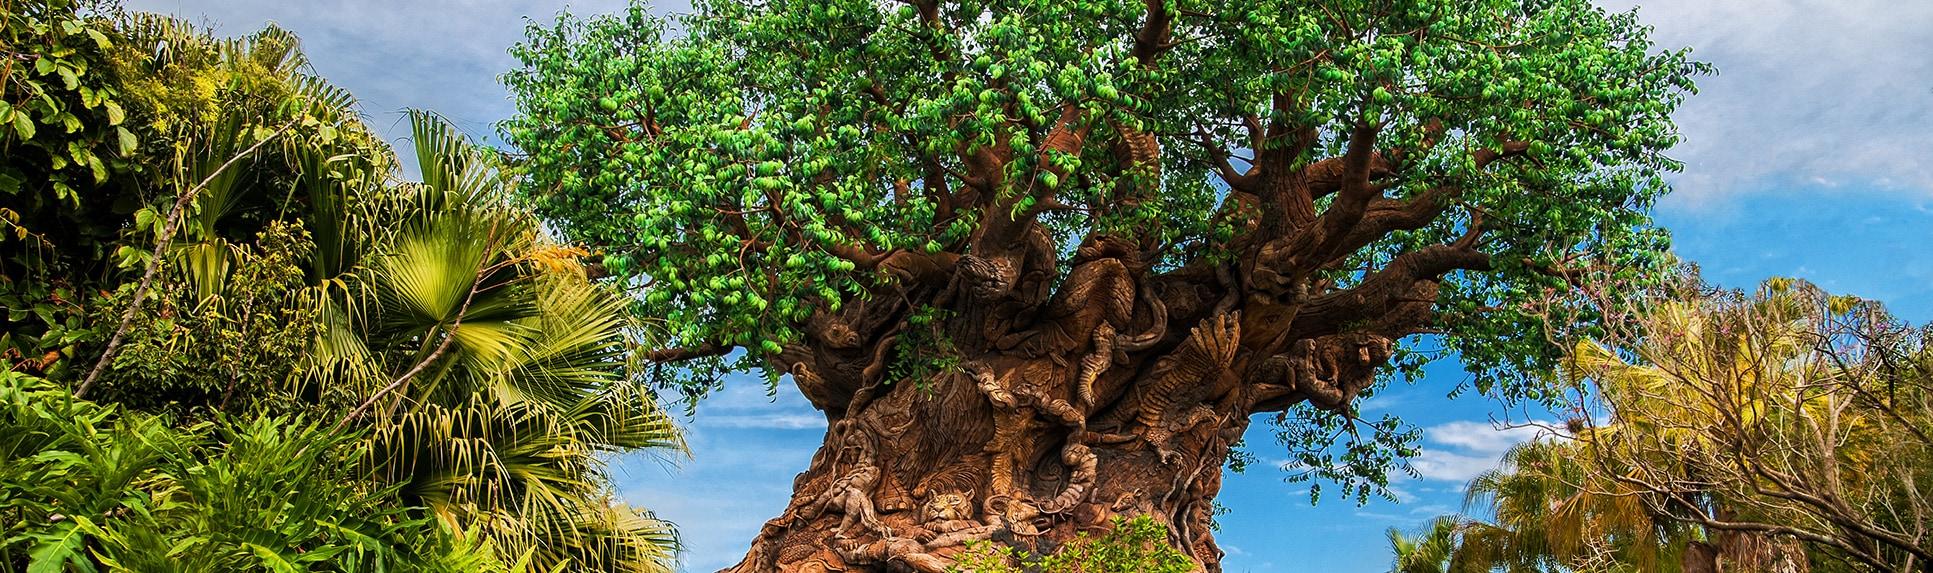 The Tree of Life at Disneys Animal Kingdom park